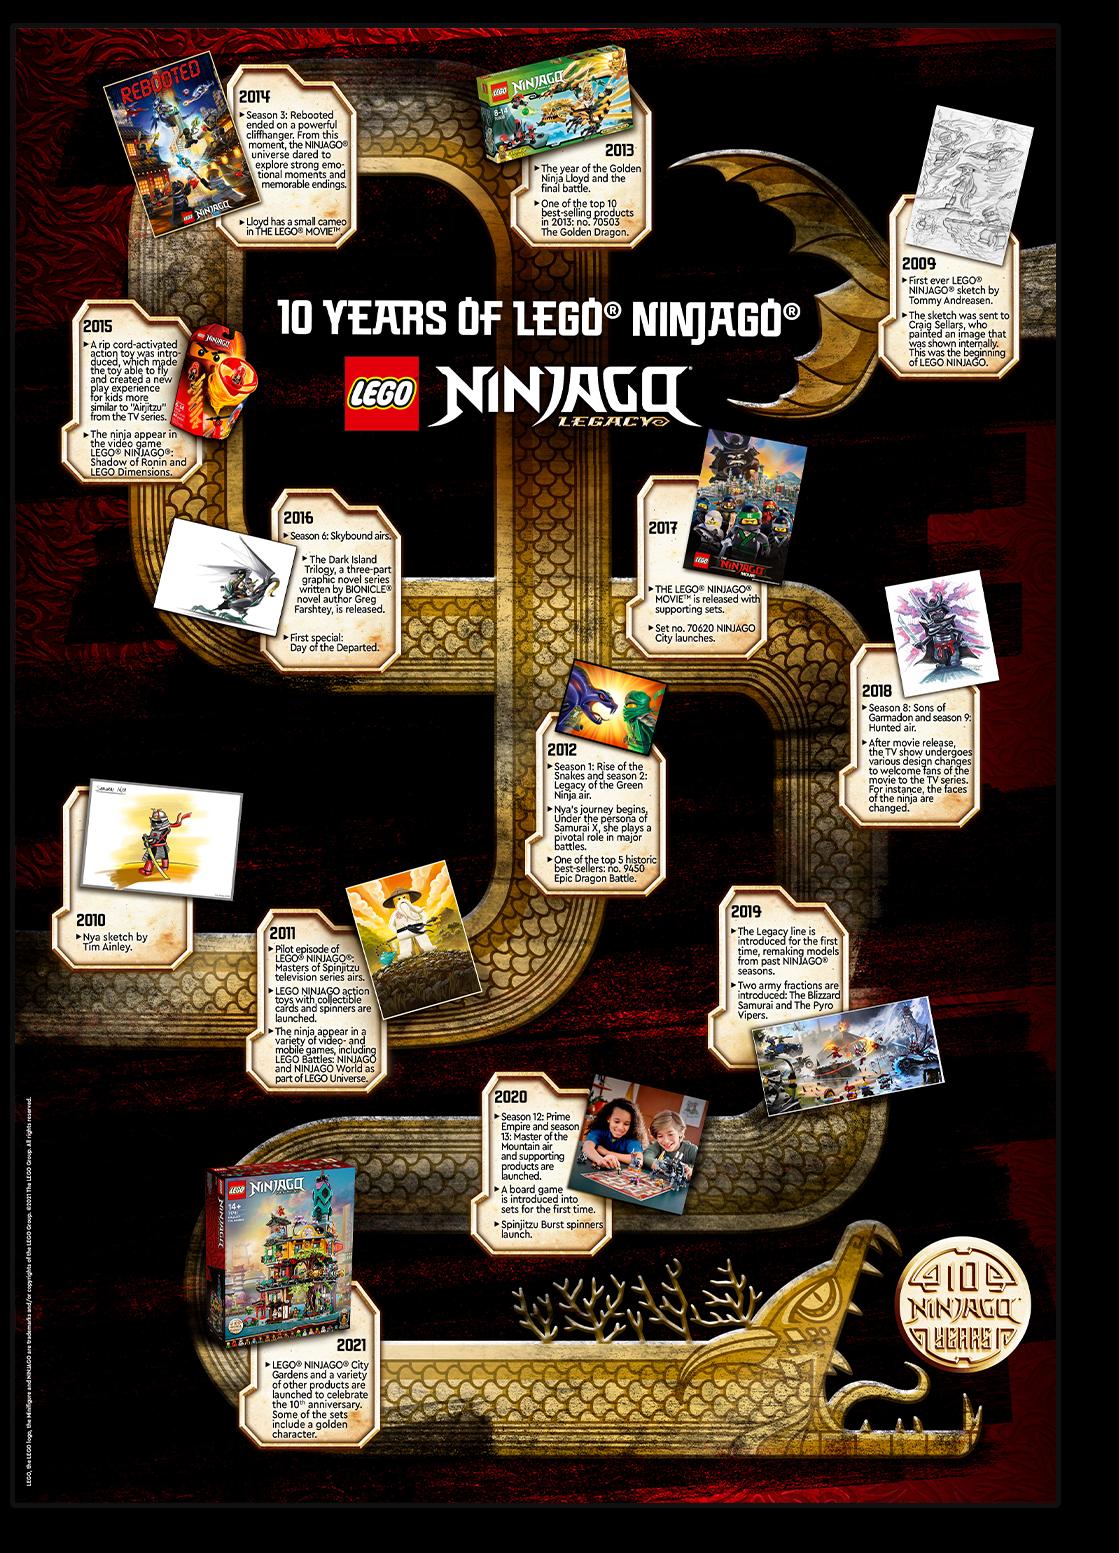 Ninjago's 10thAnniversary Poster